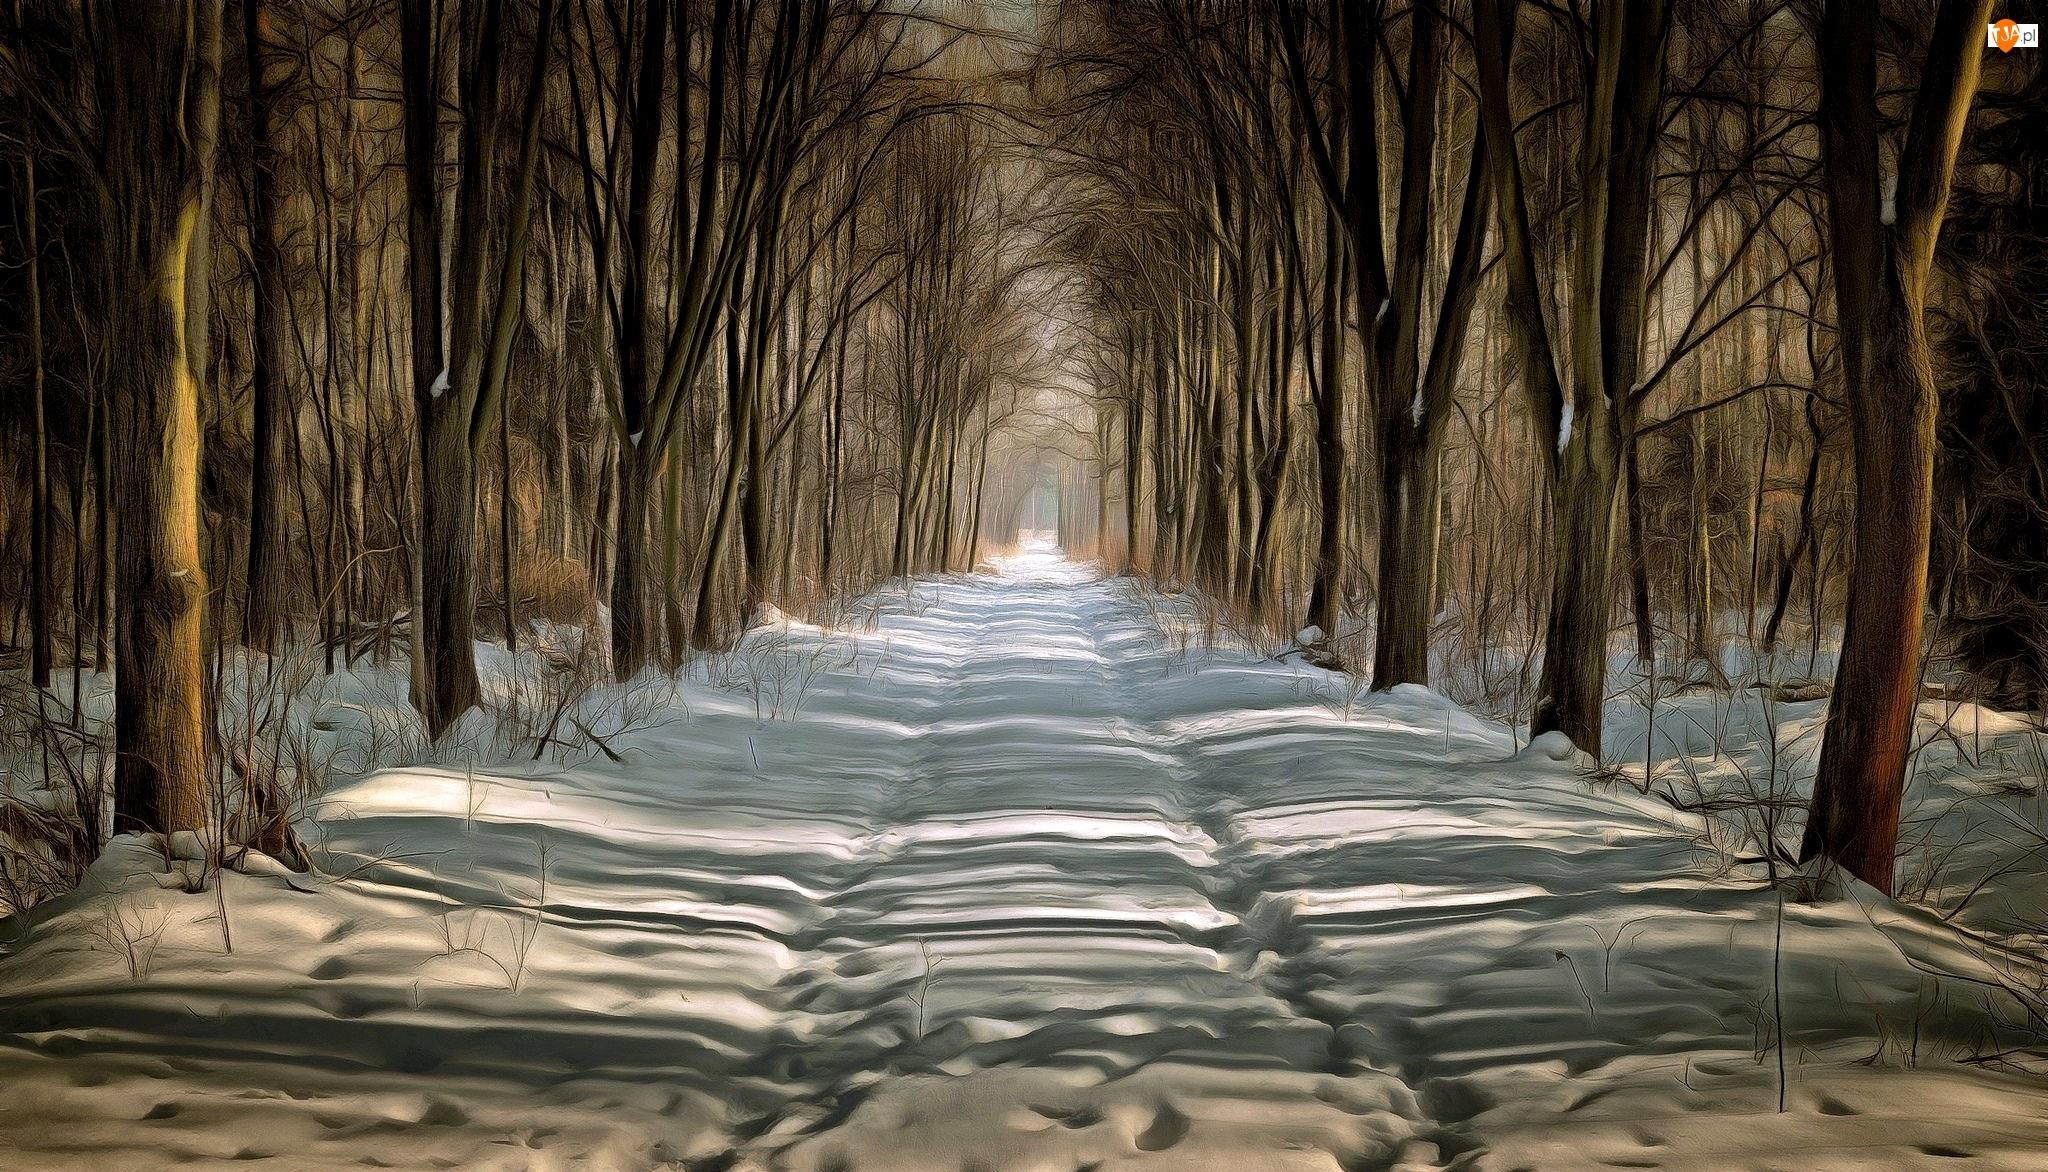 Drzewa, Grafika, Las, Zima, Droga